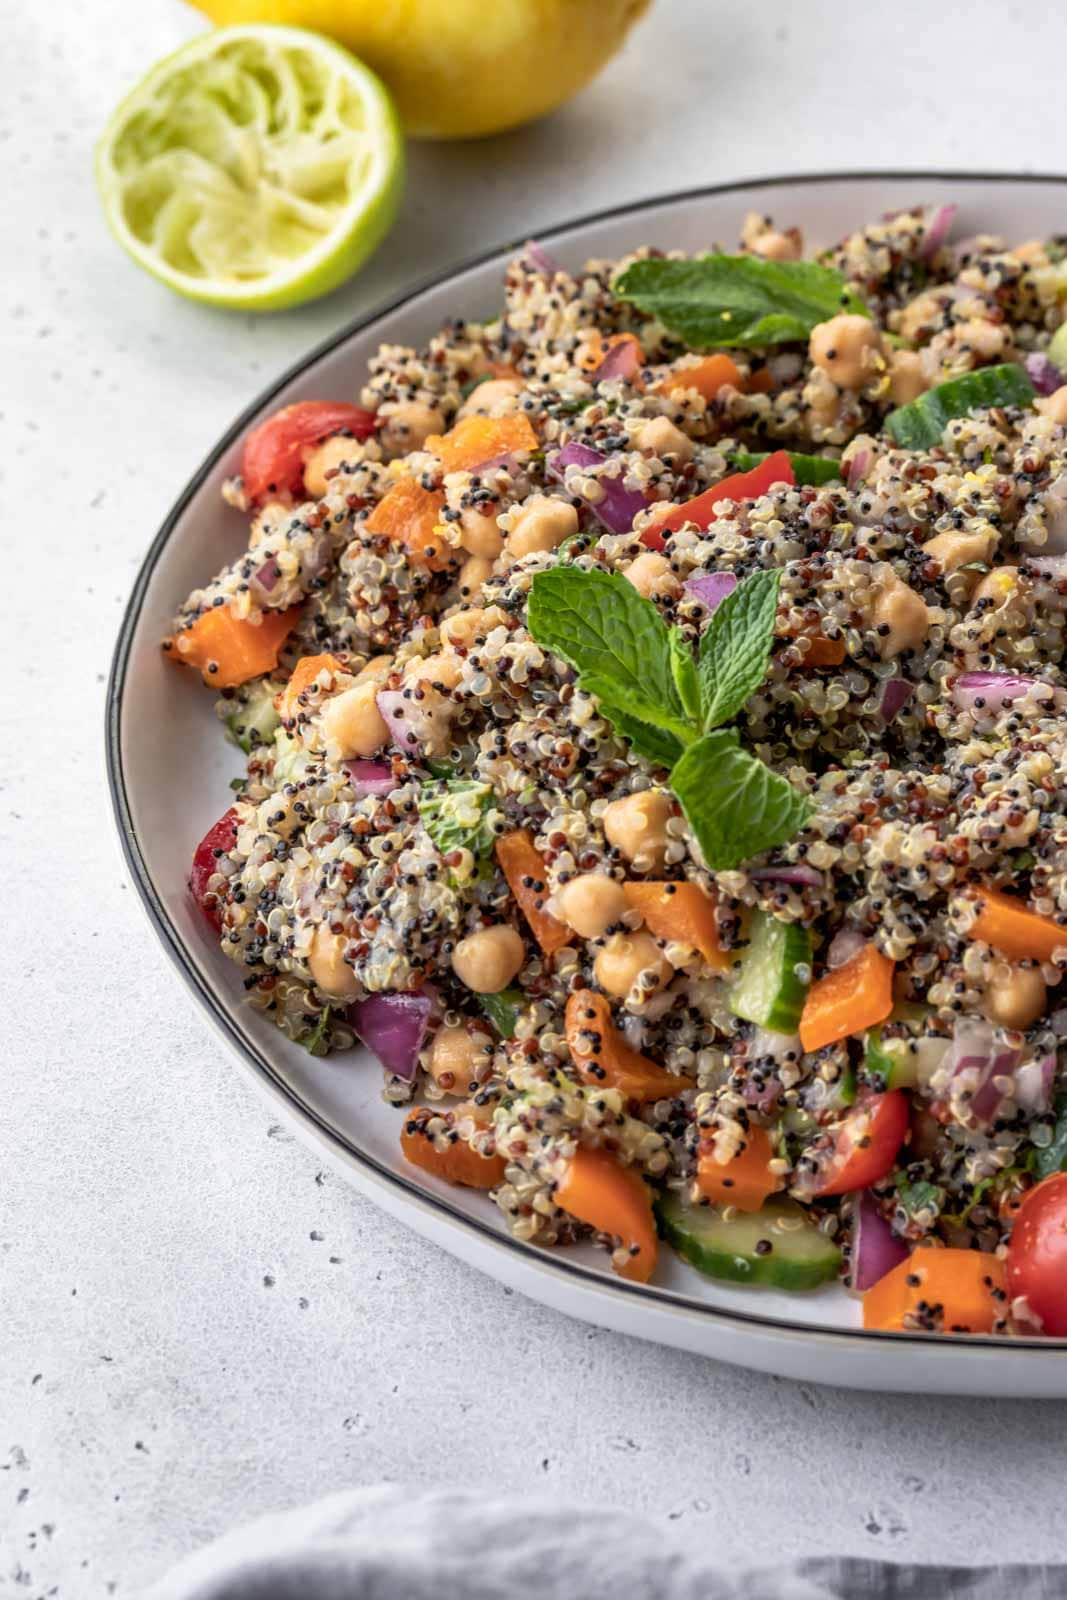 mint leaves garnishing quinoa salad